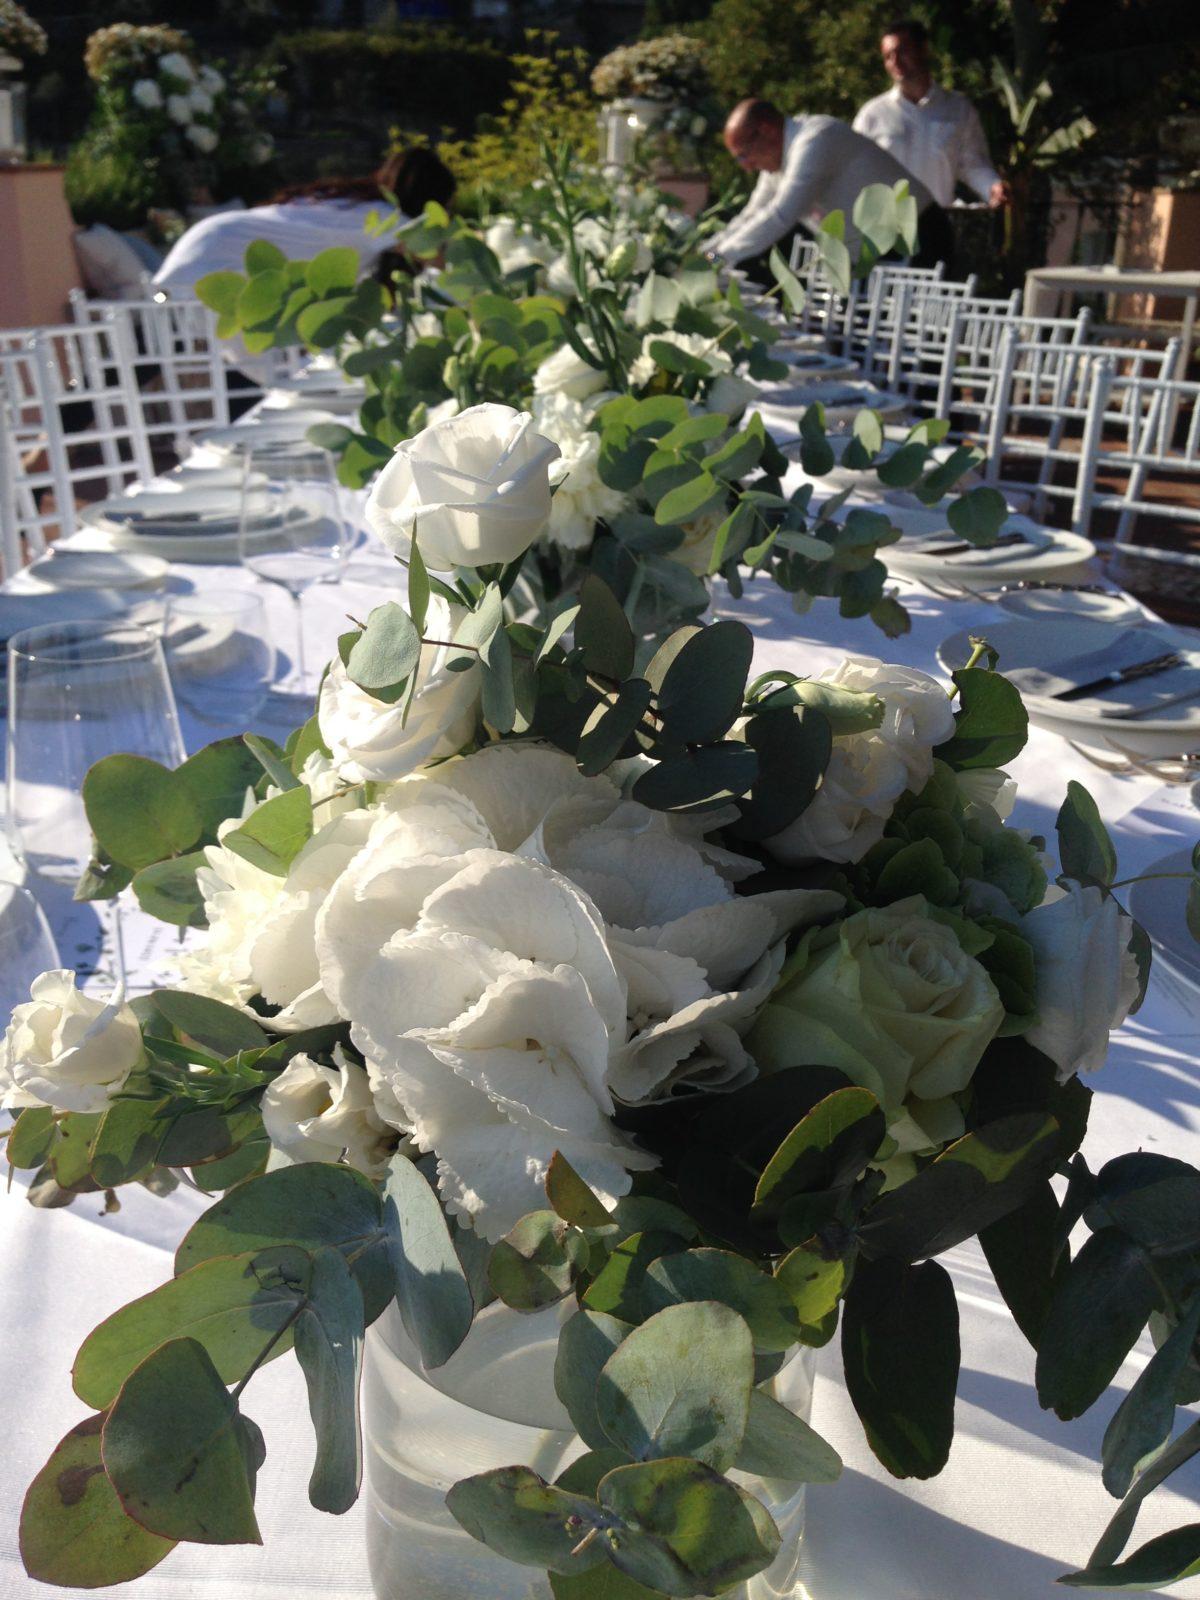 Laura and Jarrod fresh flowers wedding table decorations